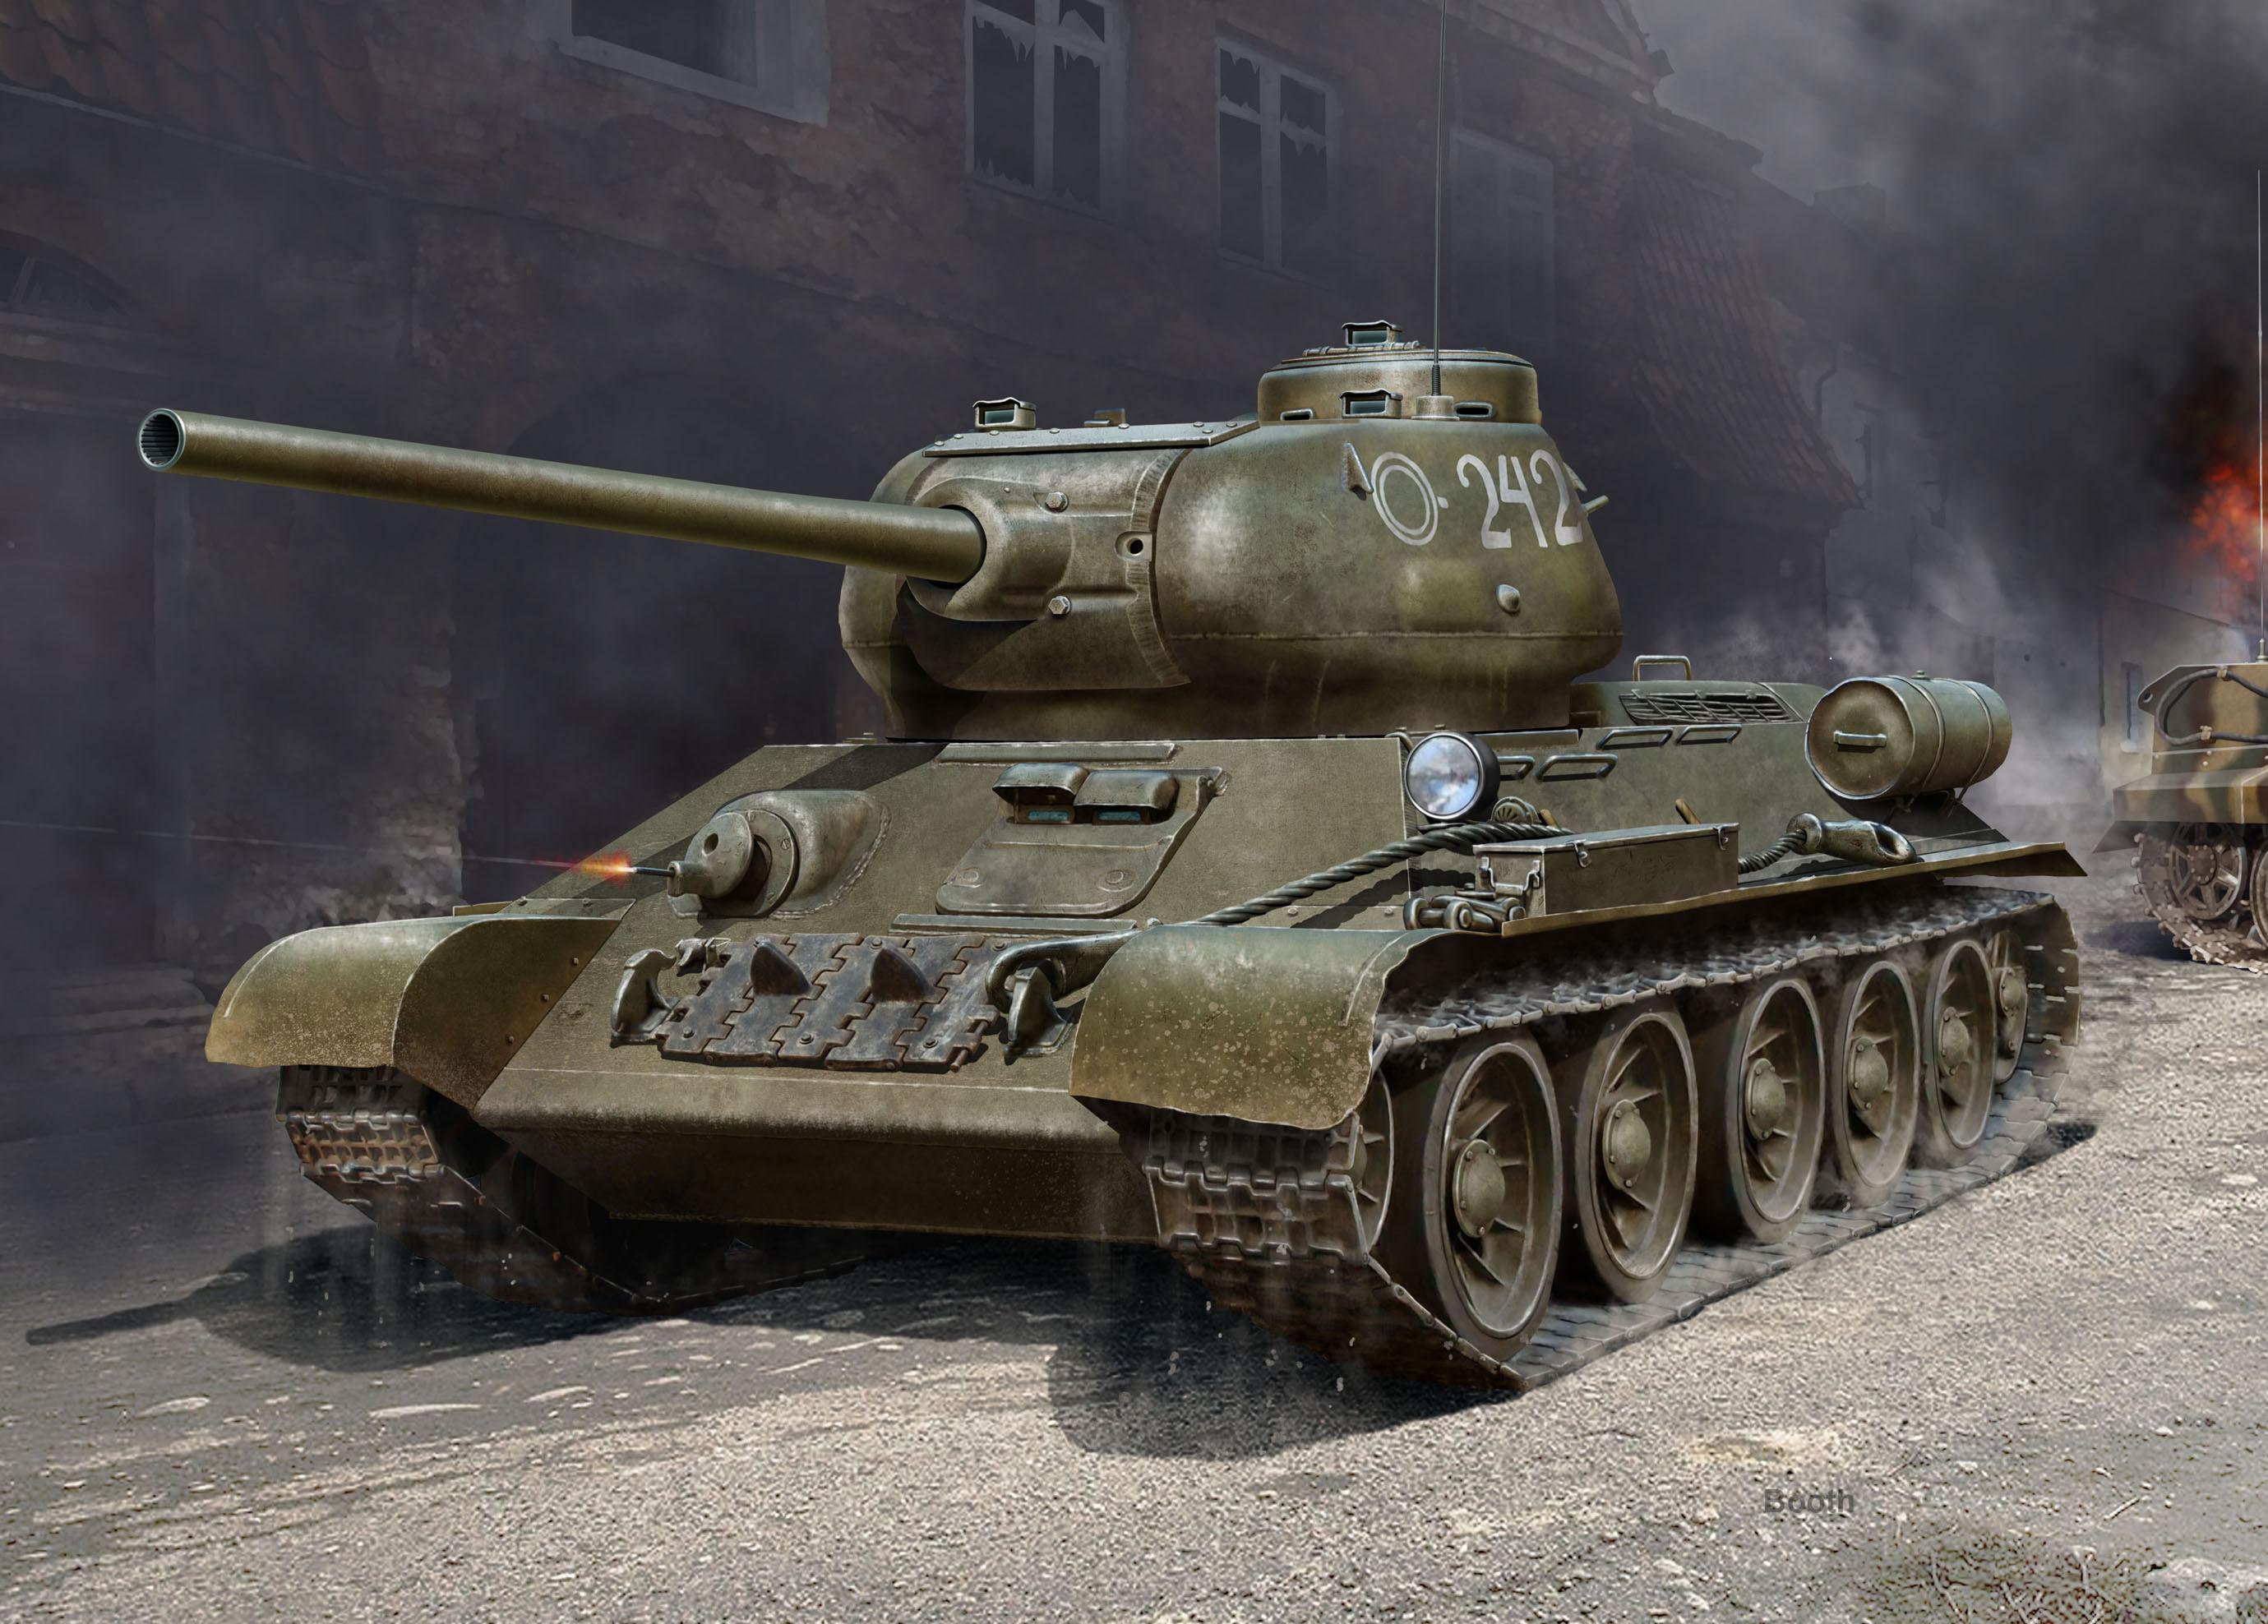 ICM _-34-85, WWII Soviet Medium Tank